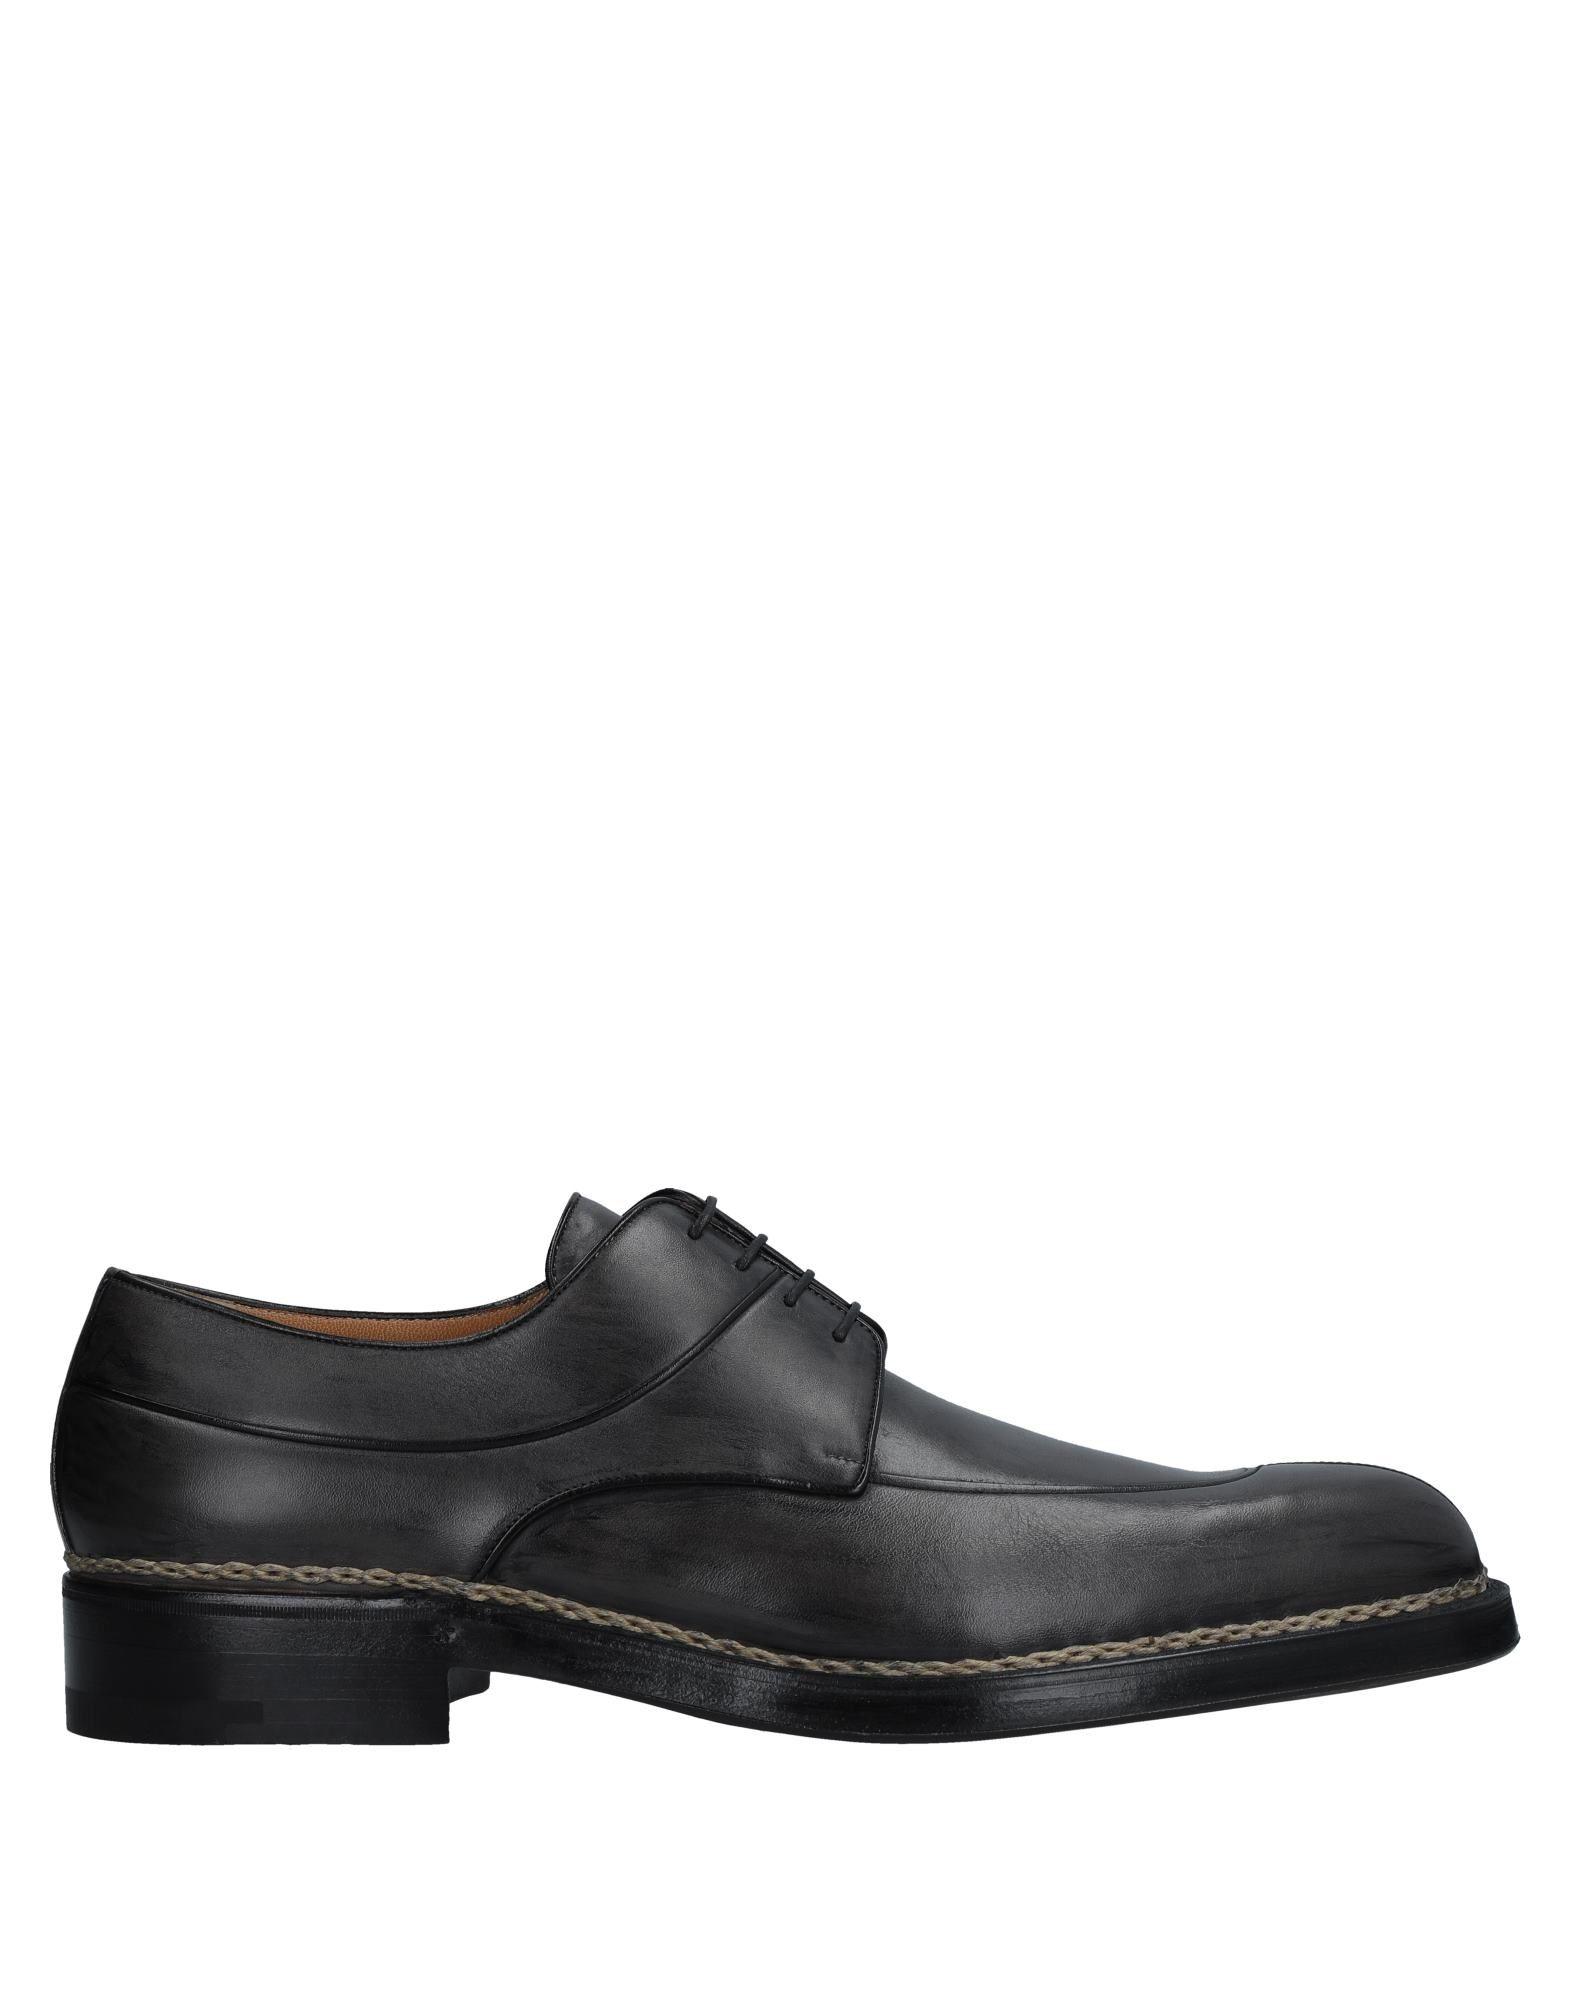 A.Testoni Schnürschuhe Herren  11540252OU Gute Qualität beliebte Schuhe